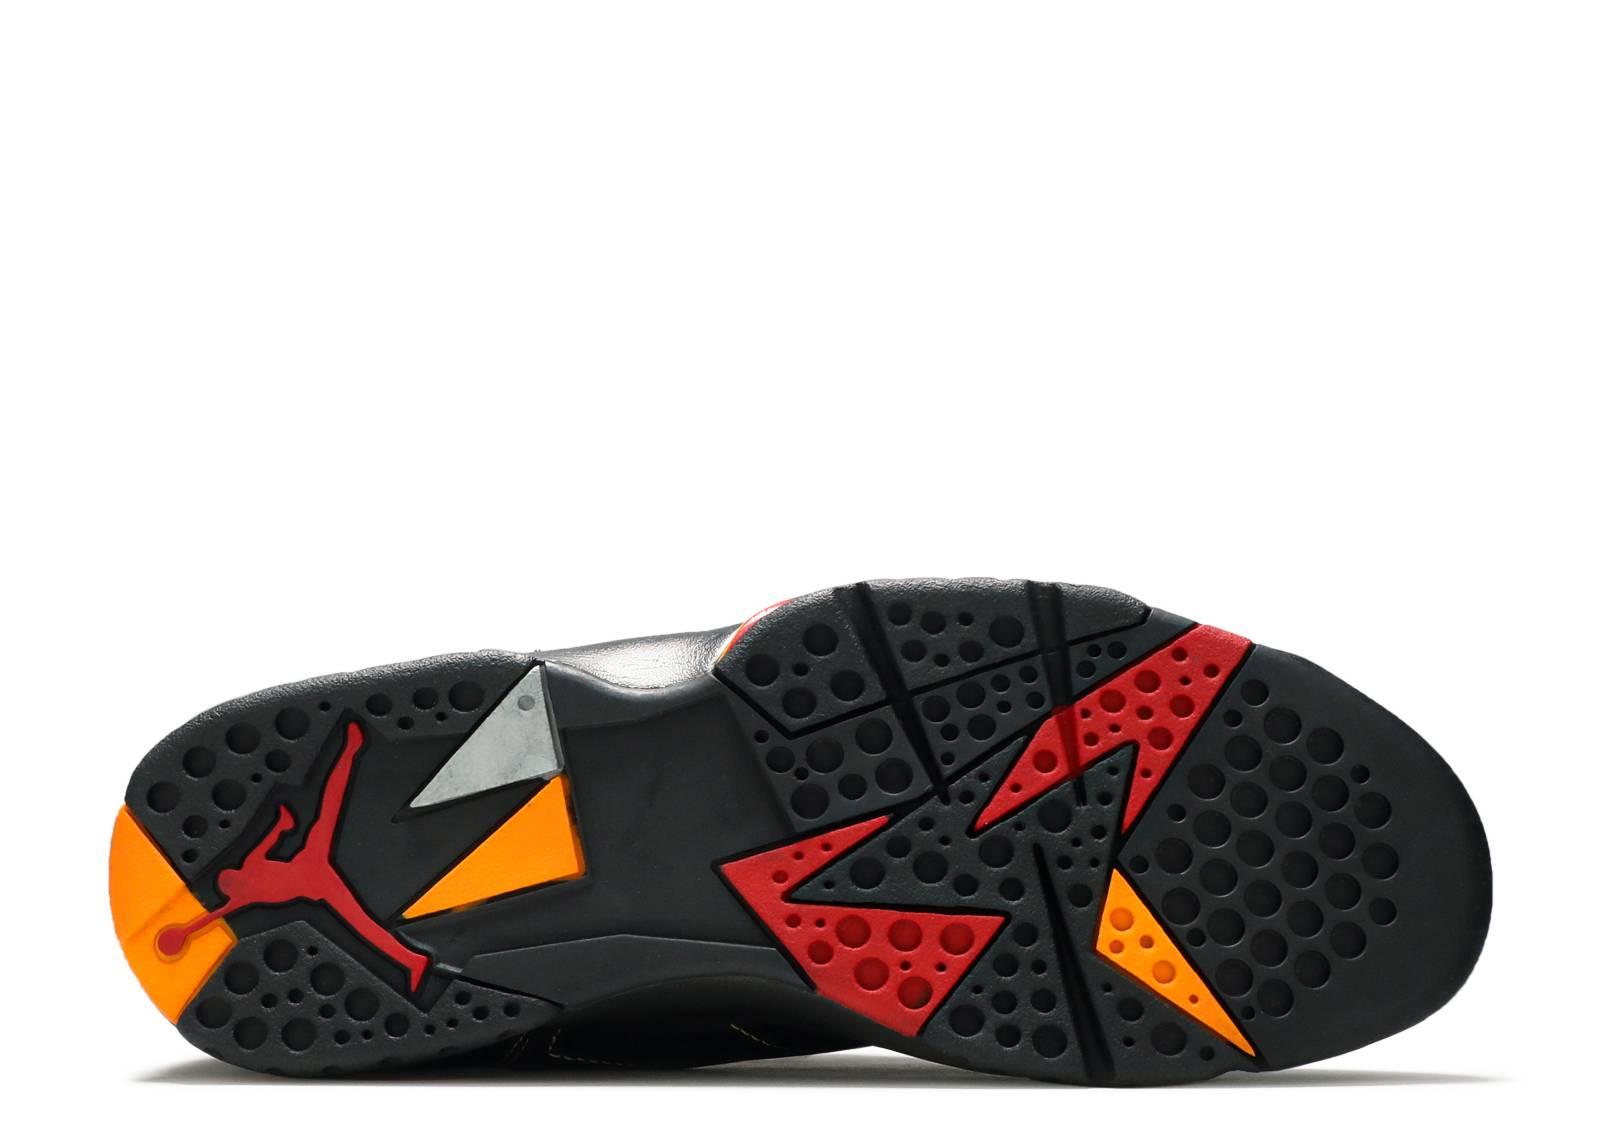 Air Jordan 7 Retro 'Citrus'